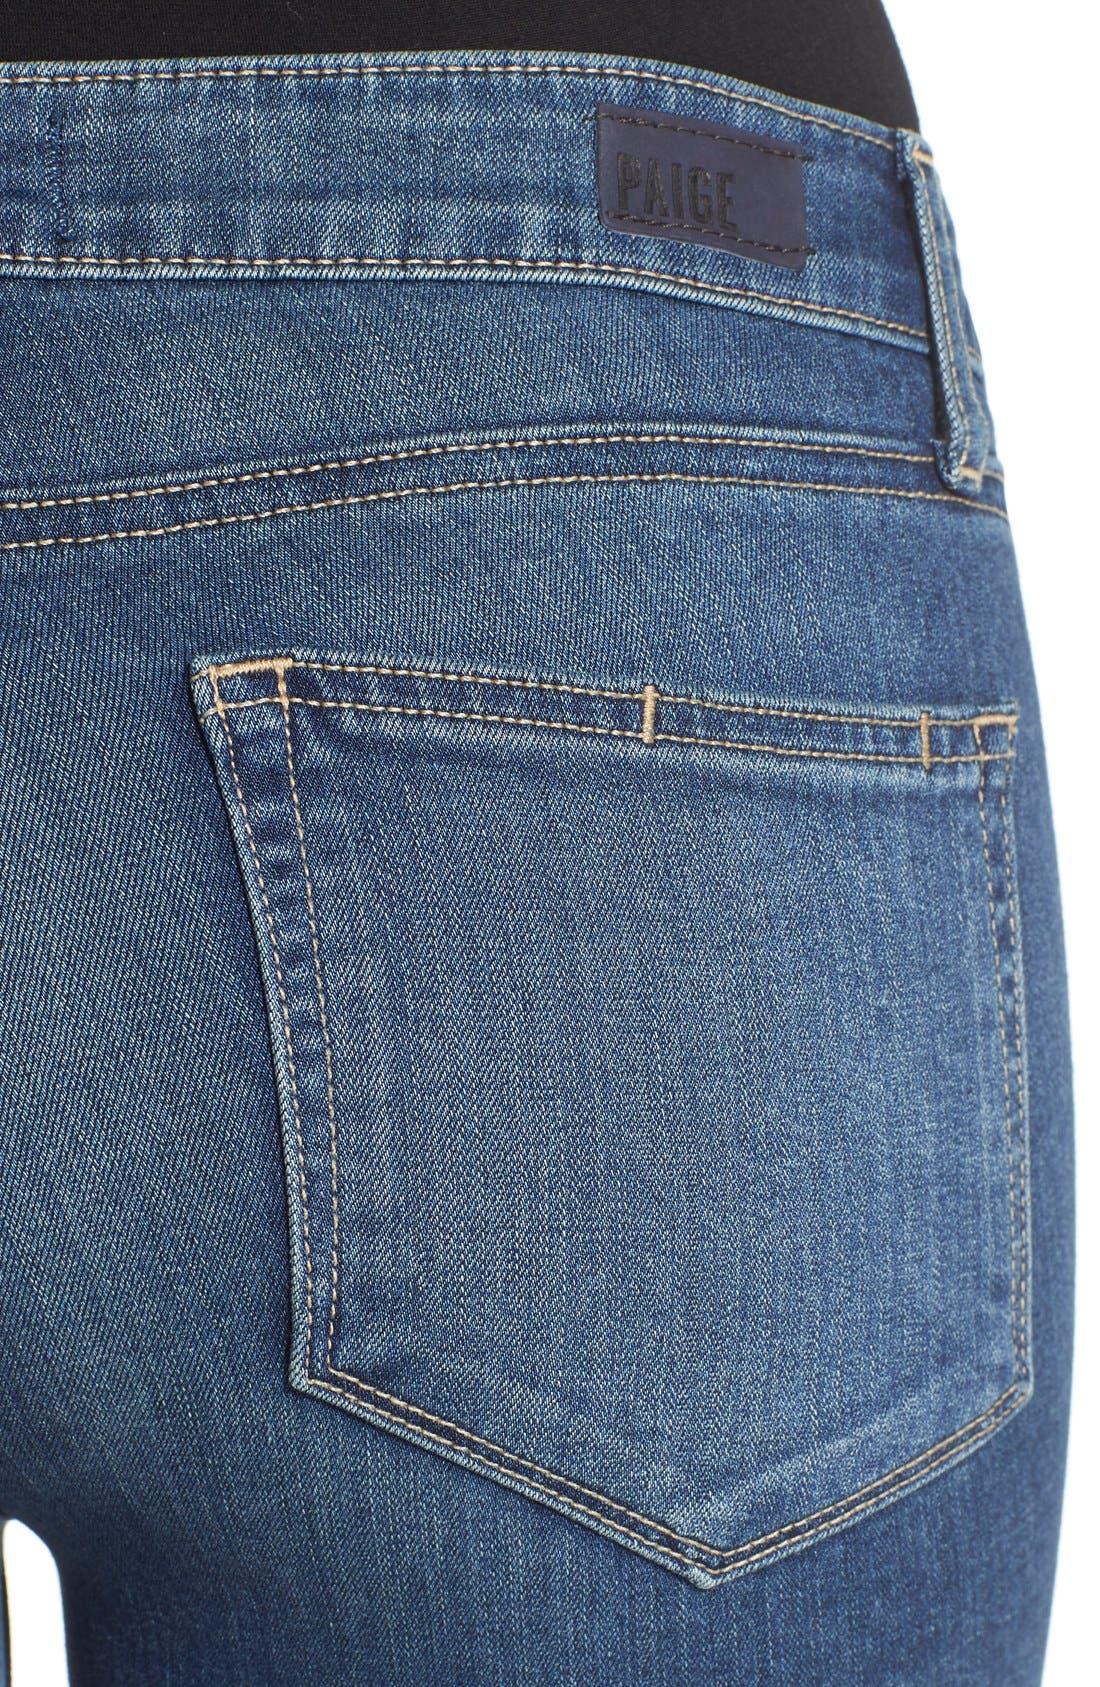 Alternate Image 4  - Paige Denim 'Transcend - Verdugo' Crop Jeans (Nadeen)